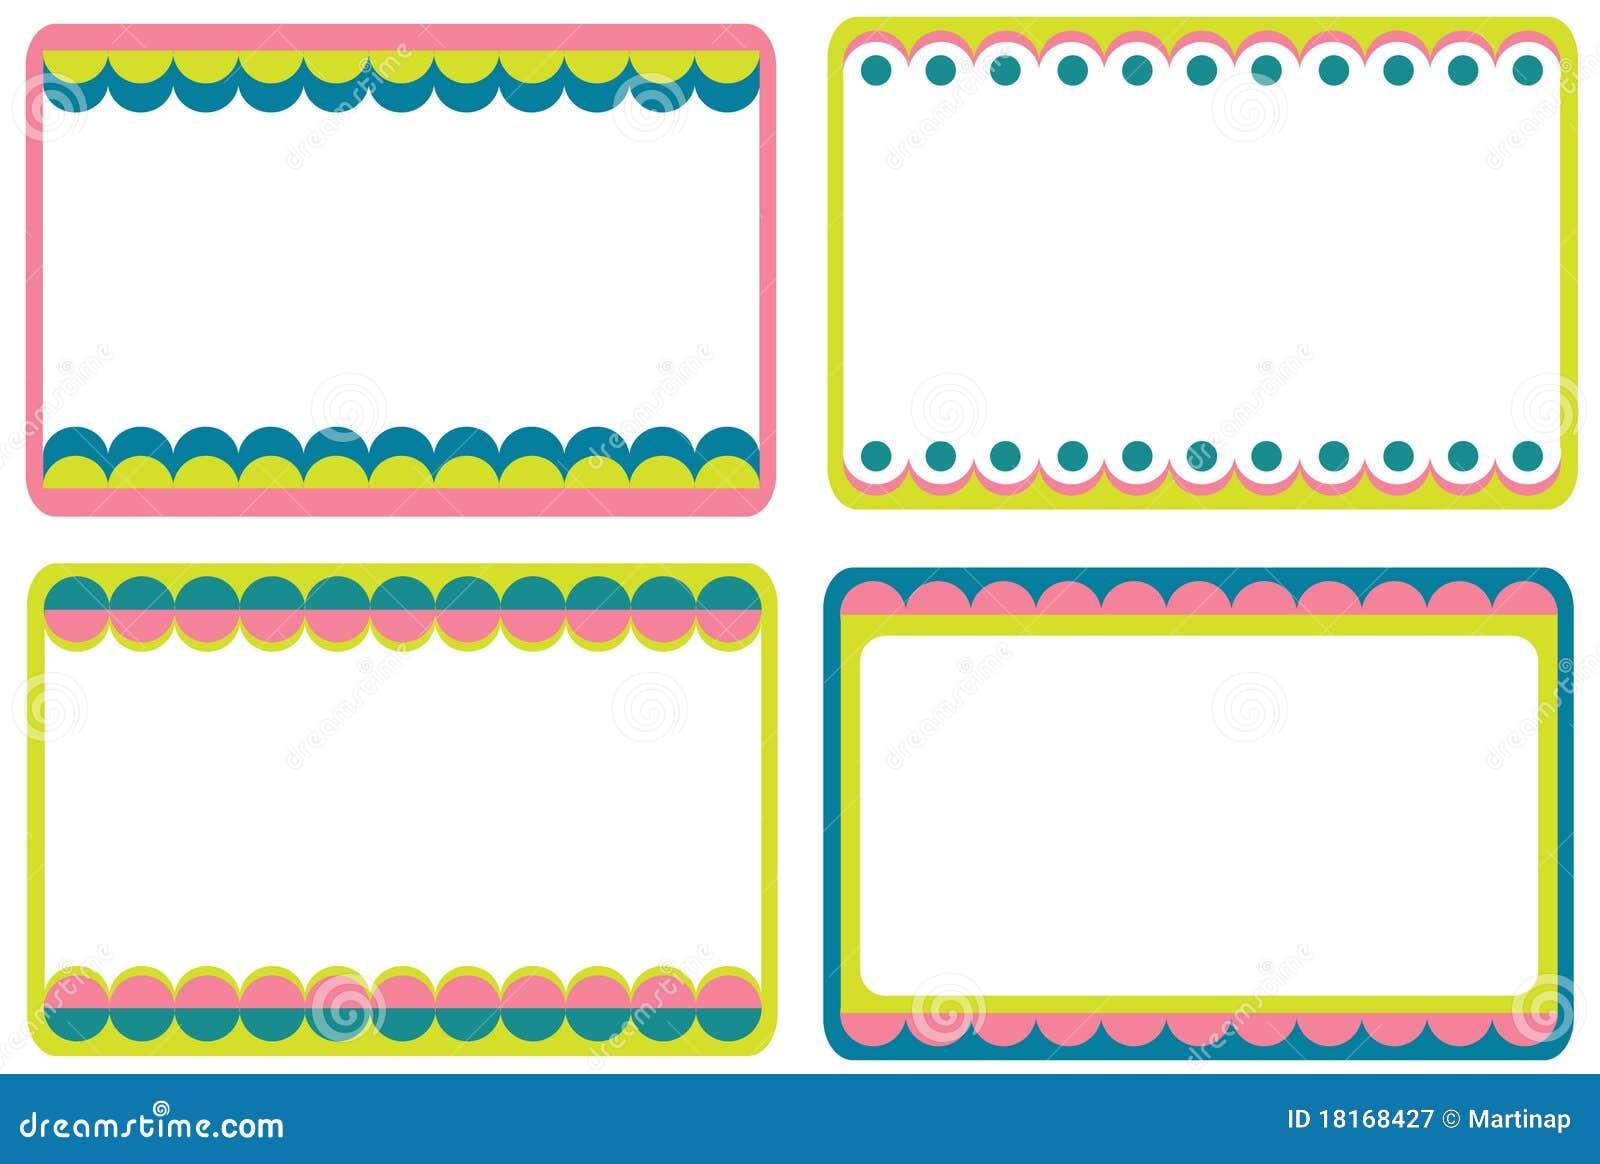 Set of cute frames stock vector. Illustration of gift - 18168427